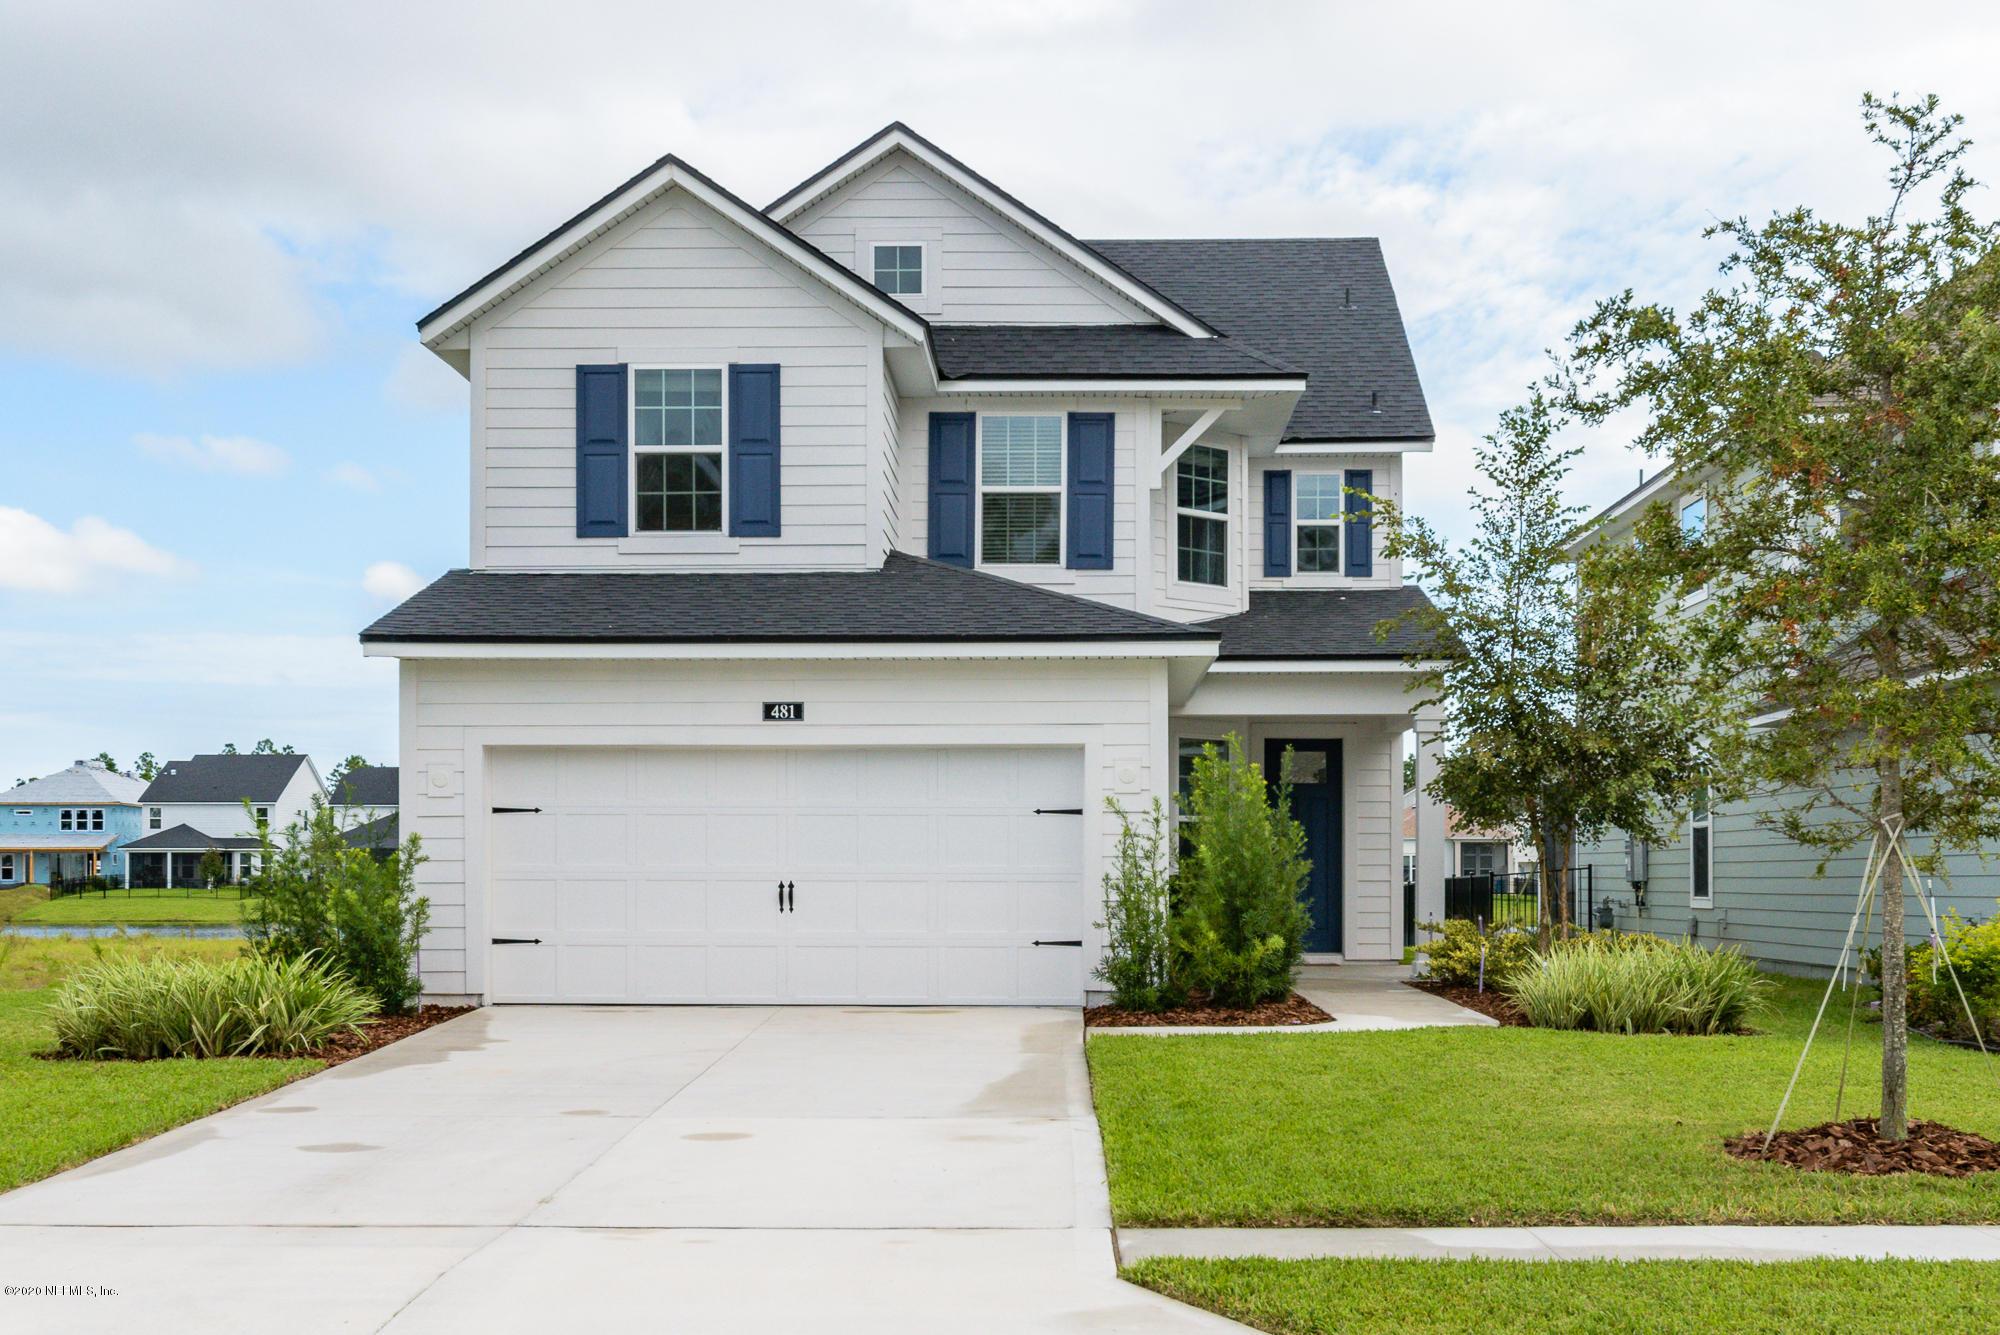 481 VISTA LAKE, PONTE VEDRA, FLORIDA 32081, 3 Bedrooms Bedrooms, ,2 BathroomsBathrooms,Residential,For sale,VISTA LAKE,1087192